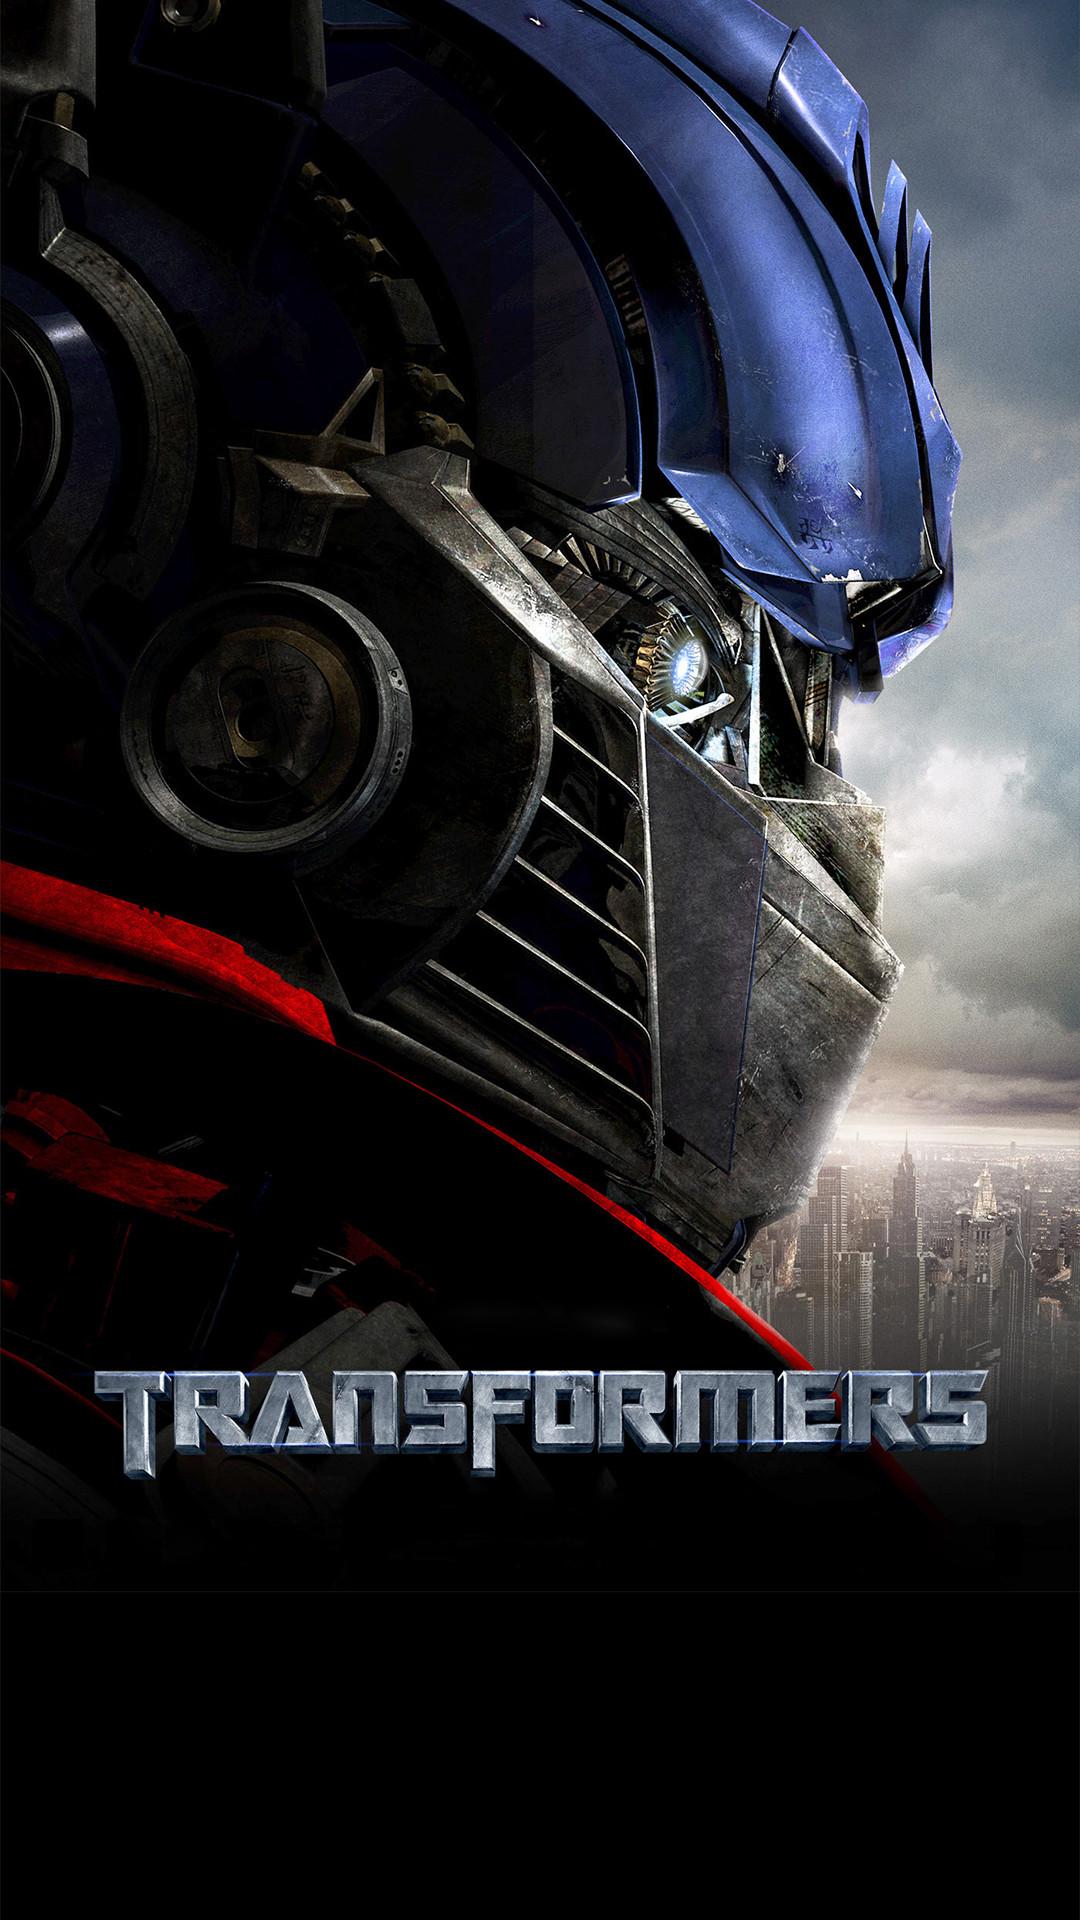 Transformers Fall Of Cybertron Hd Wallpapers 1080p Optimus Prime 2018 Wallpaper 183 ① Wallpapertag